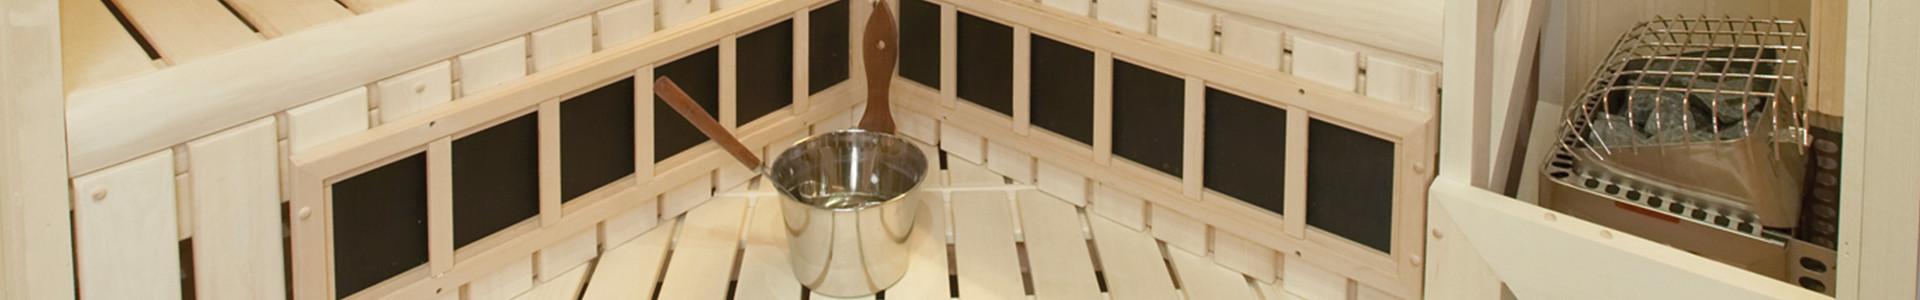 3 Benefits of Using a Sauna at Home, Portable Saunas Clive